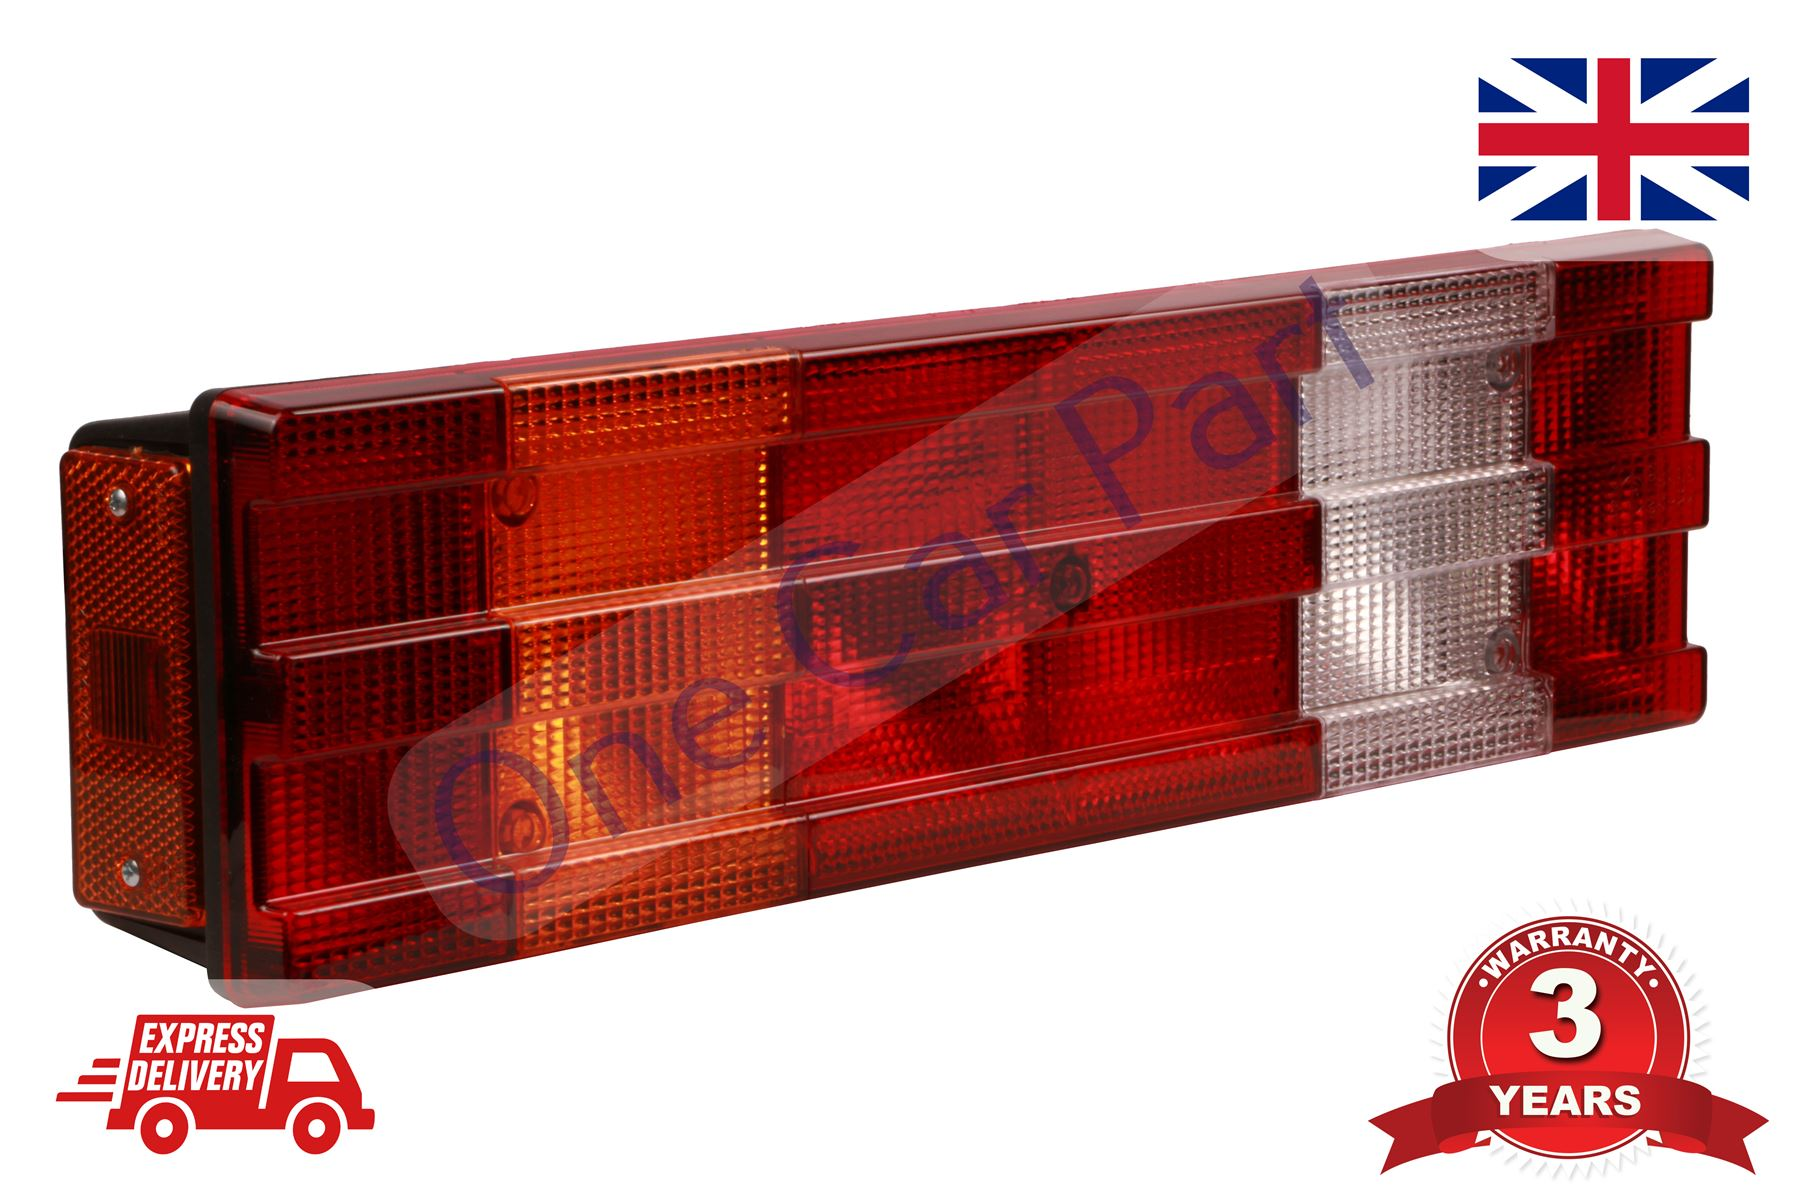 E 350 CDI 212.2 . DTE PedalBox 3S für MERCEDES-BENZ E-KLASSE S212 170KW 11 2009